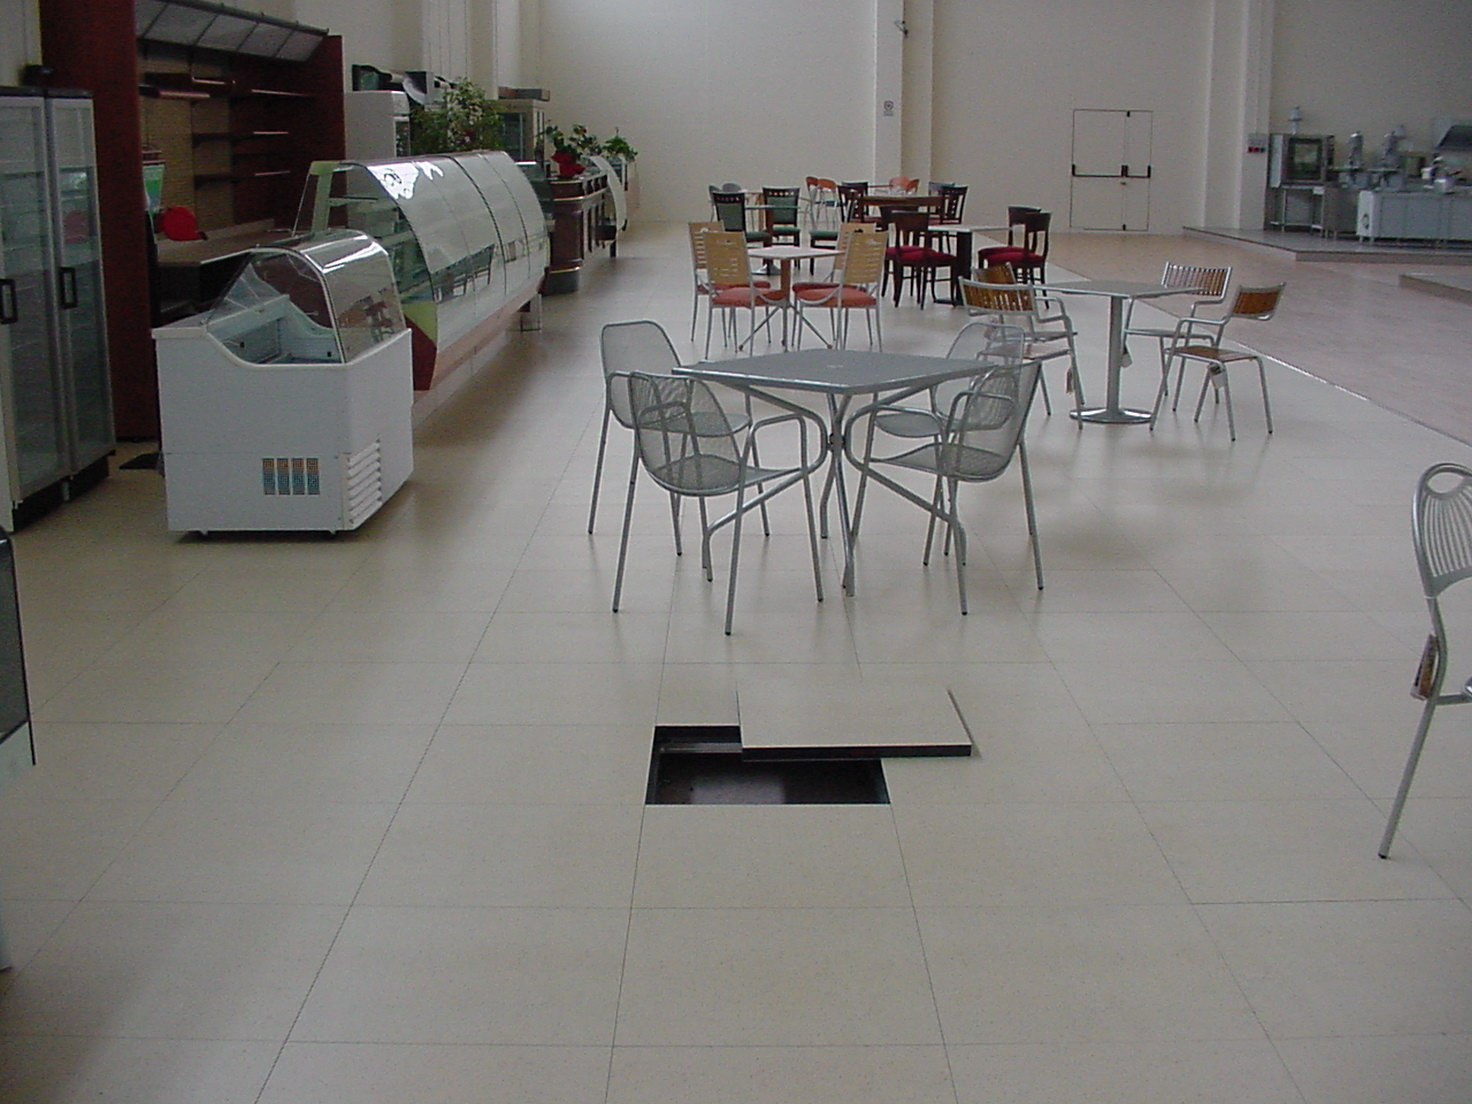 Laminate raised floor